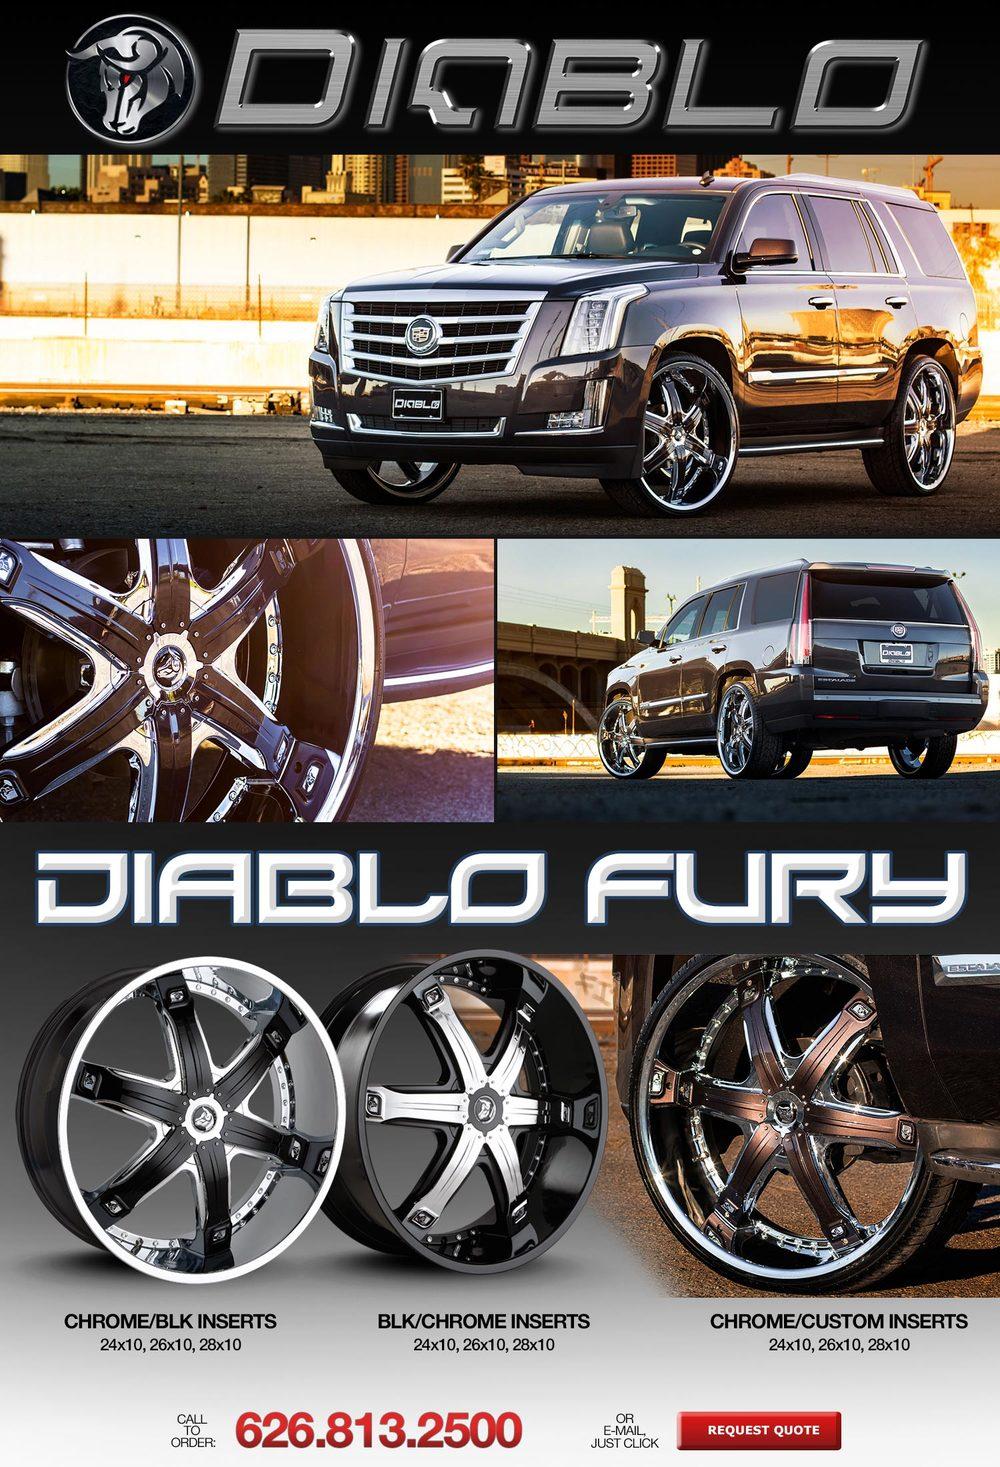 Diablo-FURY.jpg